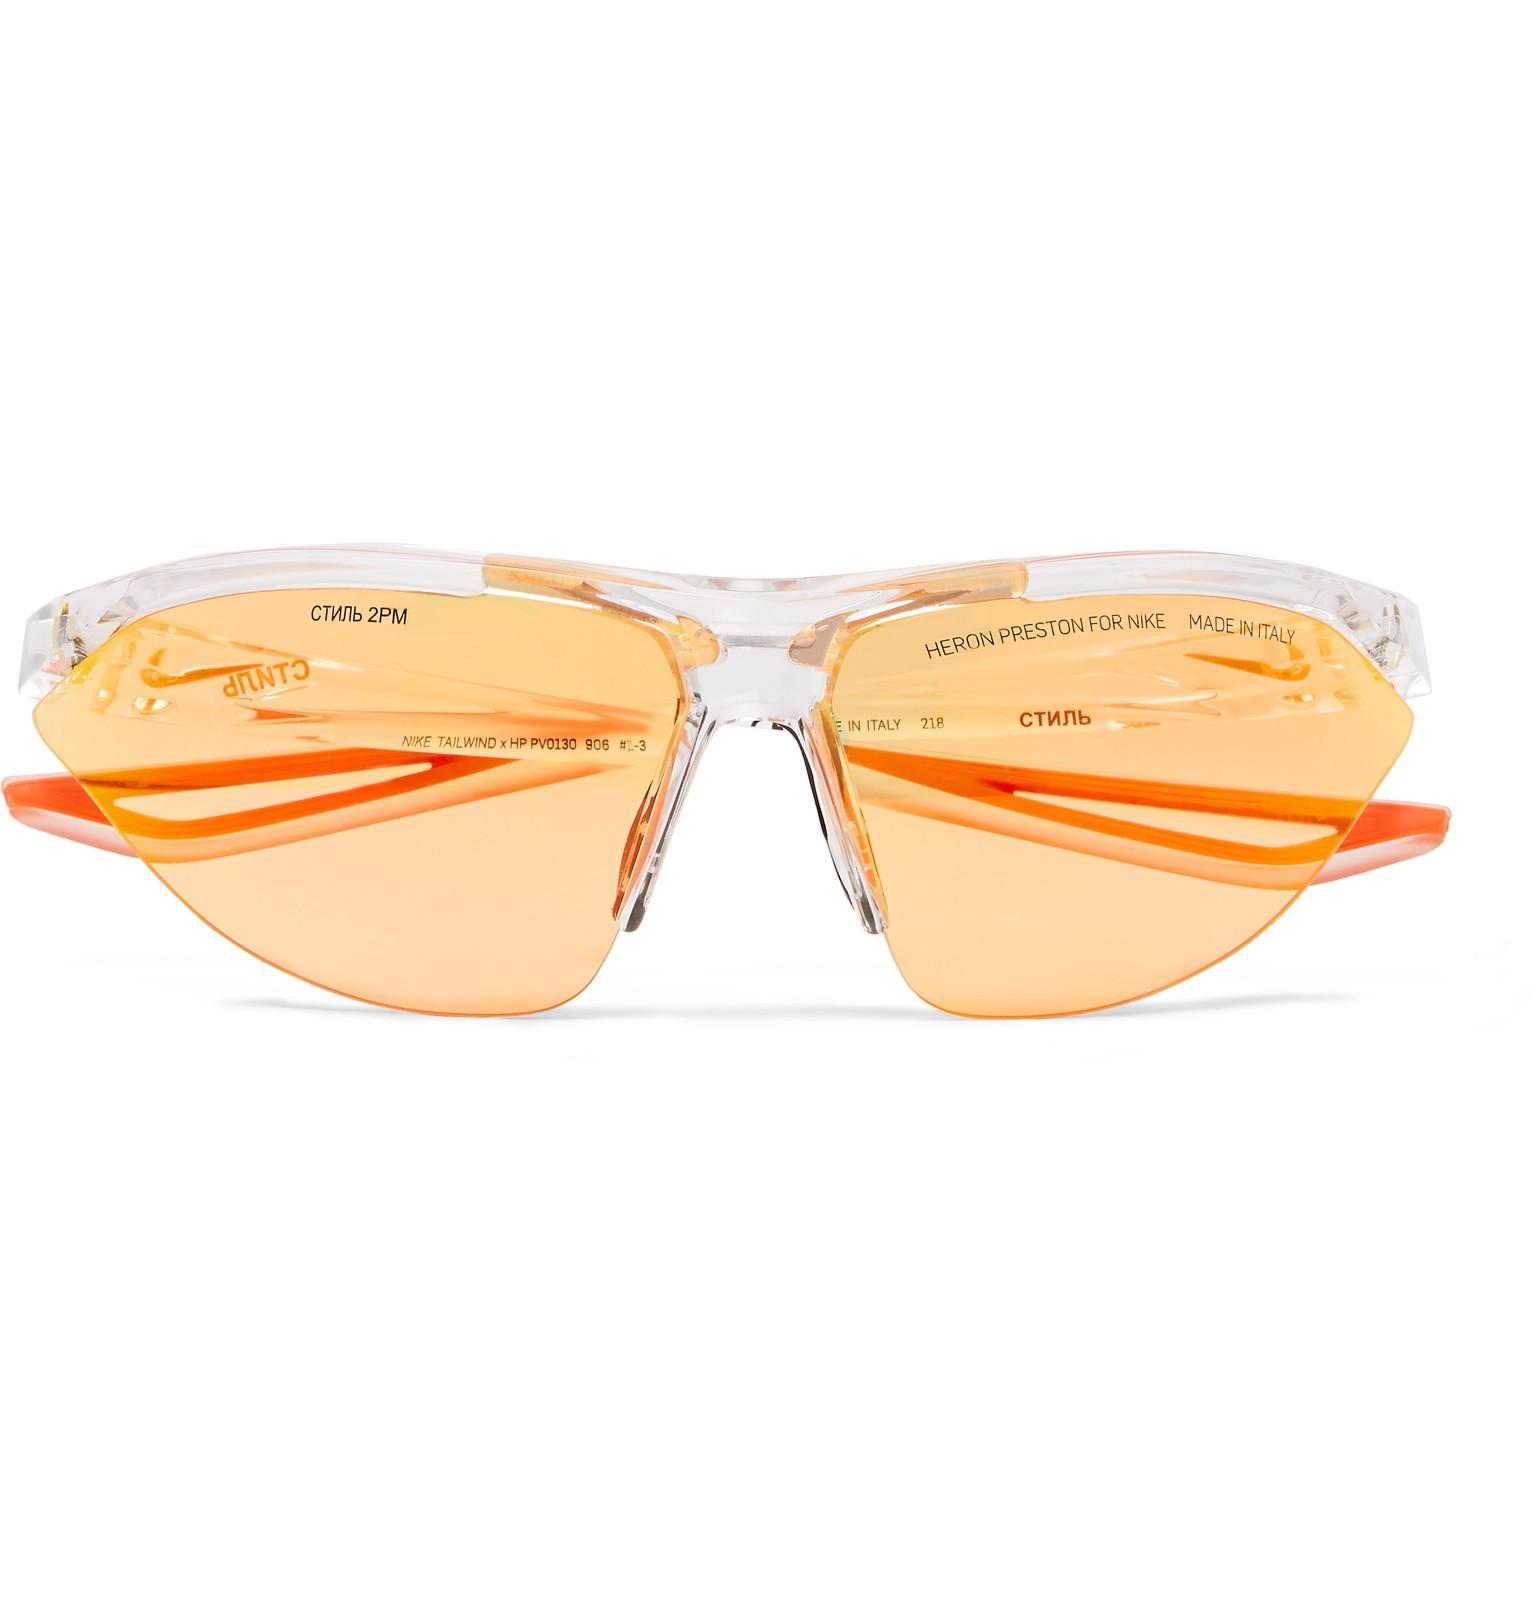 0dd7589a96 Lyst - Heron Preston + Nike Tailwind Polycarbonate Sunglasses With ...